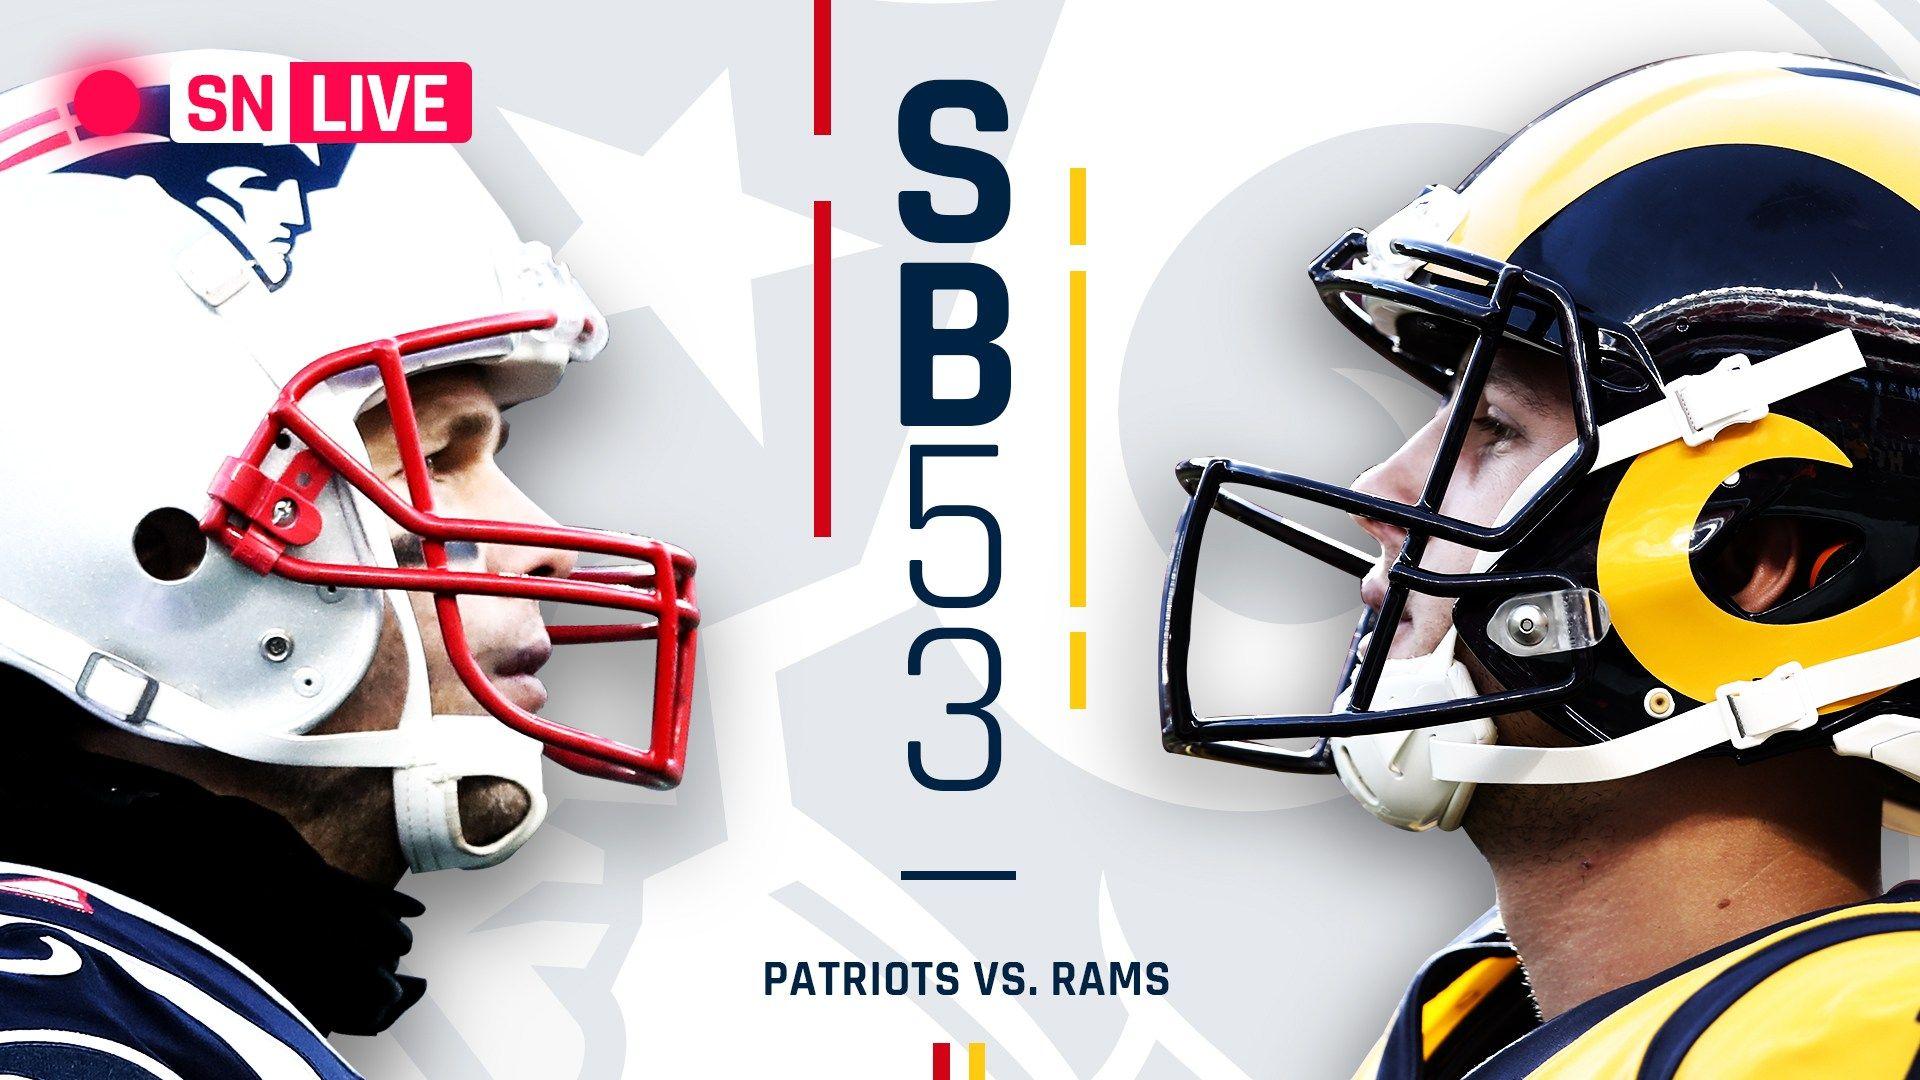 Super Bowl 53 Live Score Patriots Vs Rams Updates Highlights Results From Atlanta Patriots Super Bowl Football Helmets